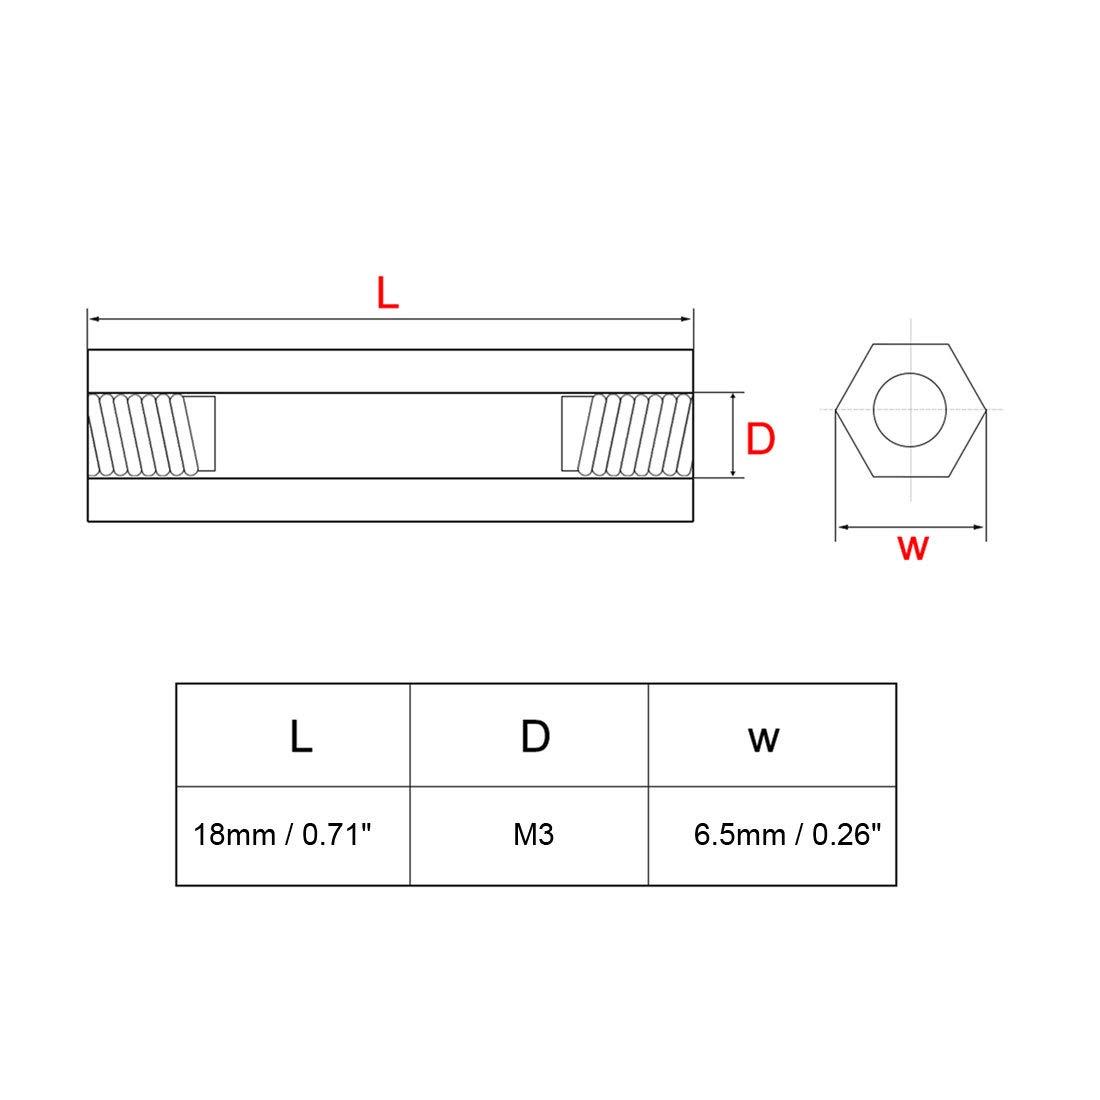 uxcell 1000pcs 3x5x5mm Nylon Straight Insulating Tube PCB Pillar Standoff Spacer